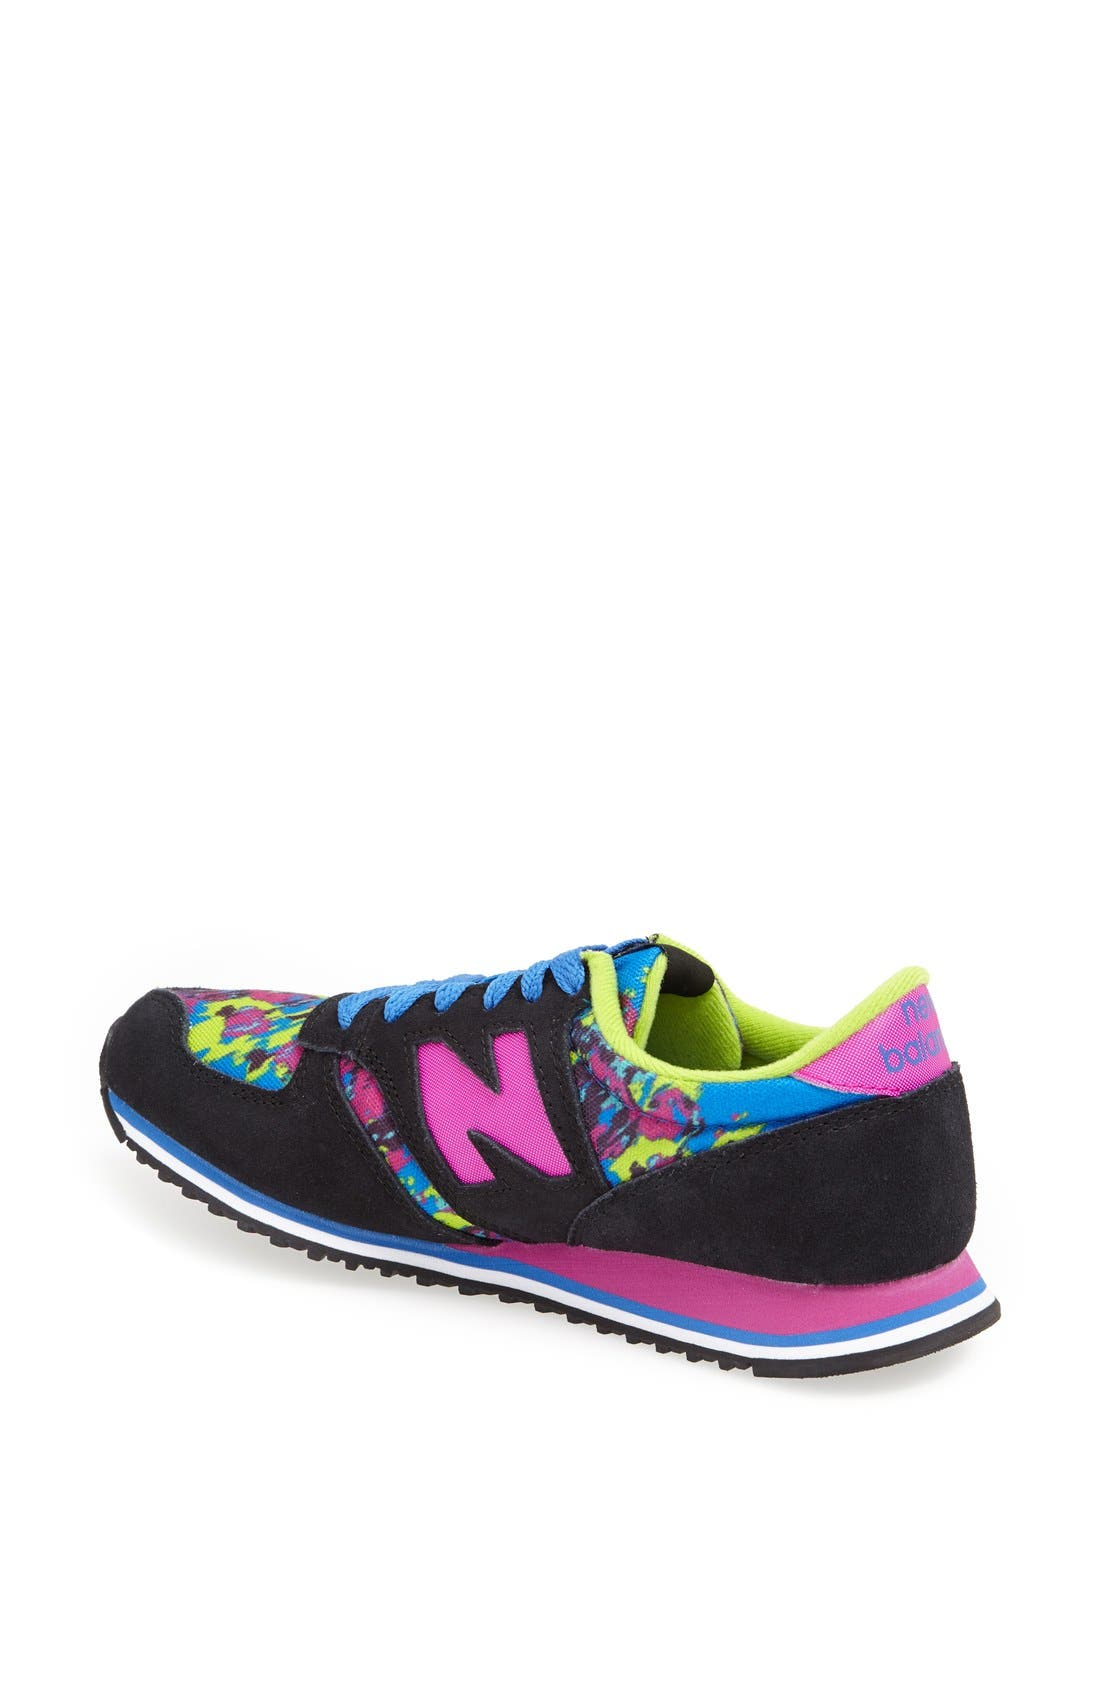 Alternate Image 2  - New Balance '420 Tomboy' Sneaker (Women)